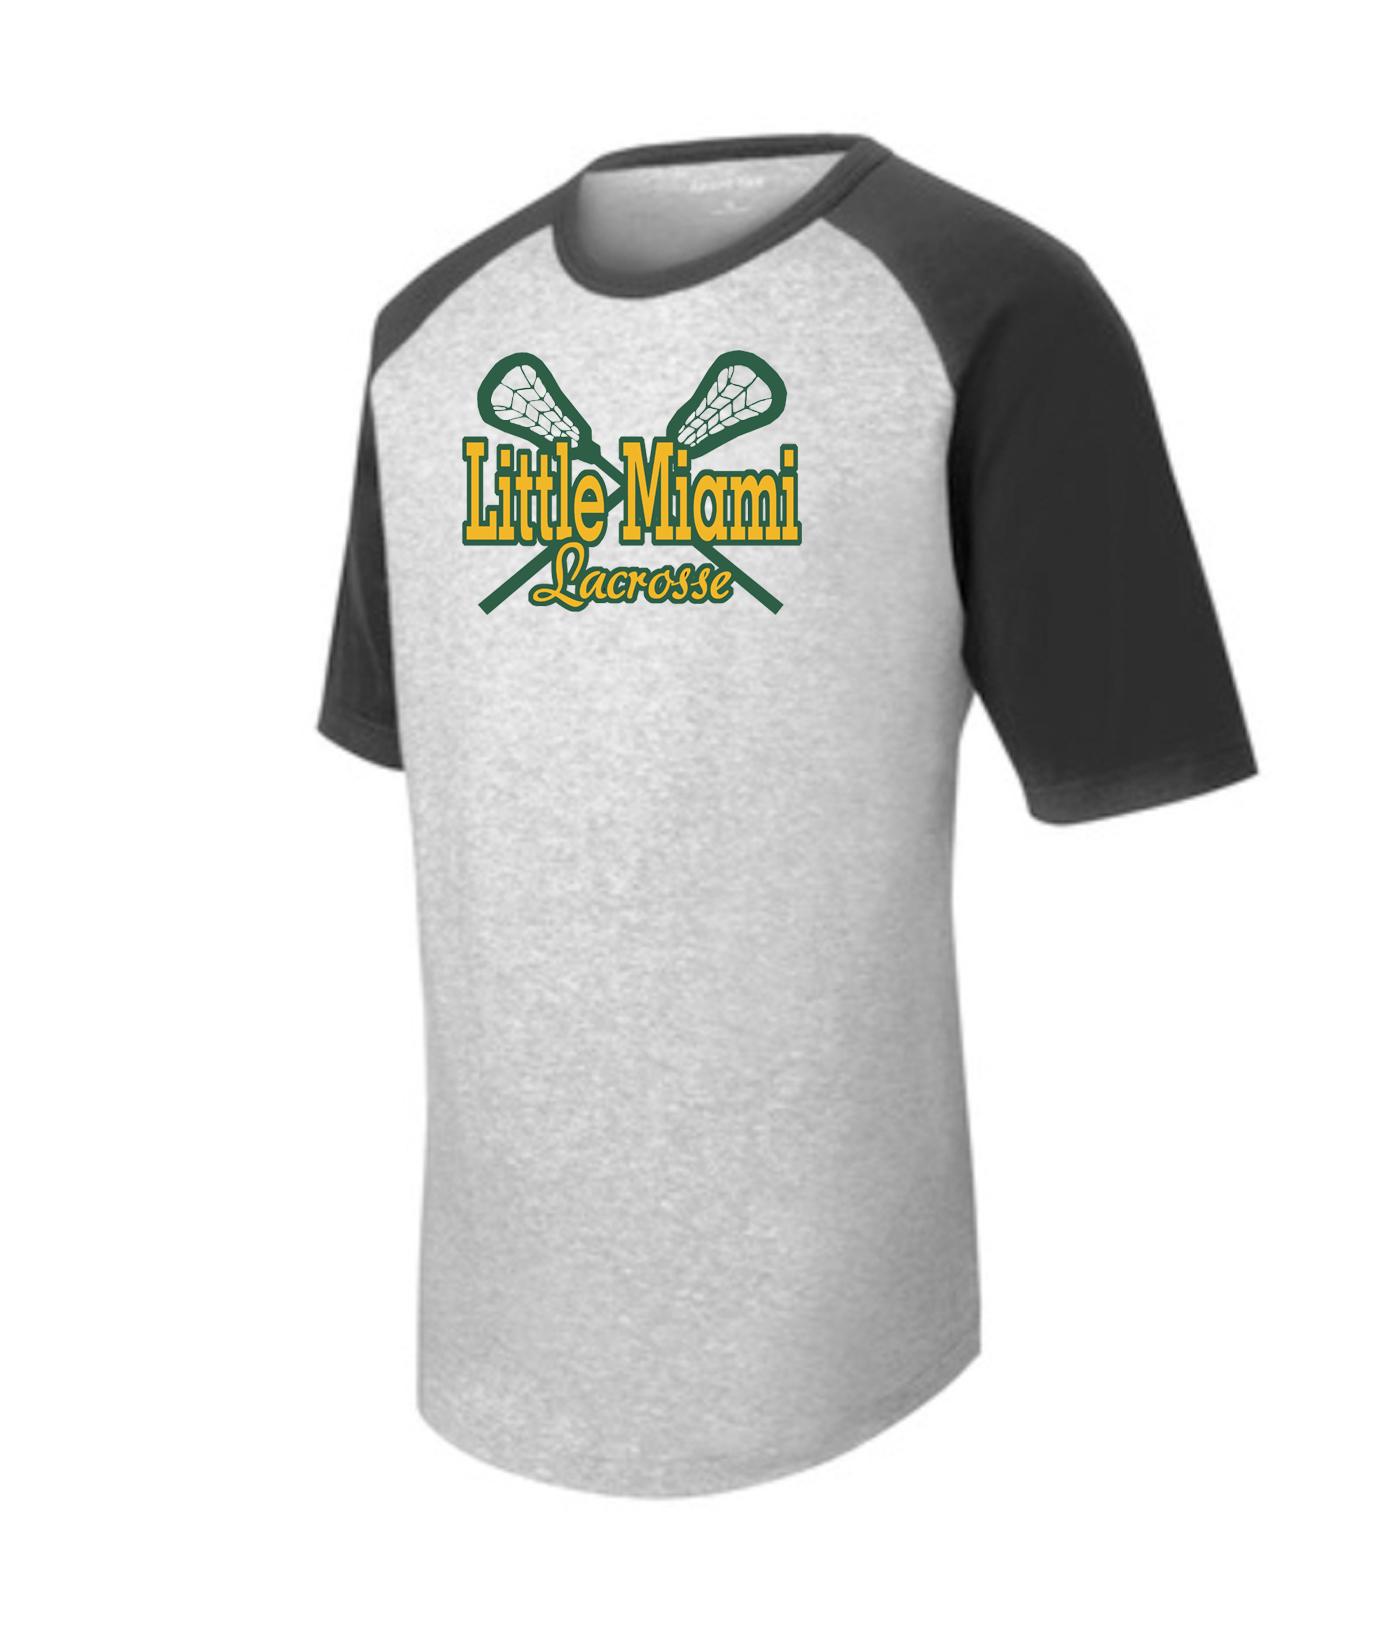 LM Lacrosse T201 Grey Black Tee Green Yellow